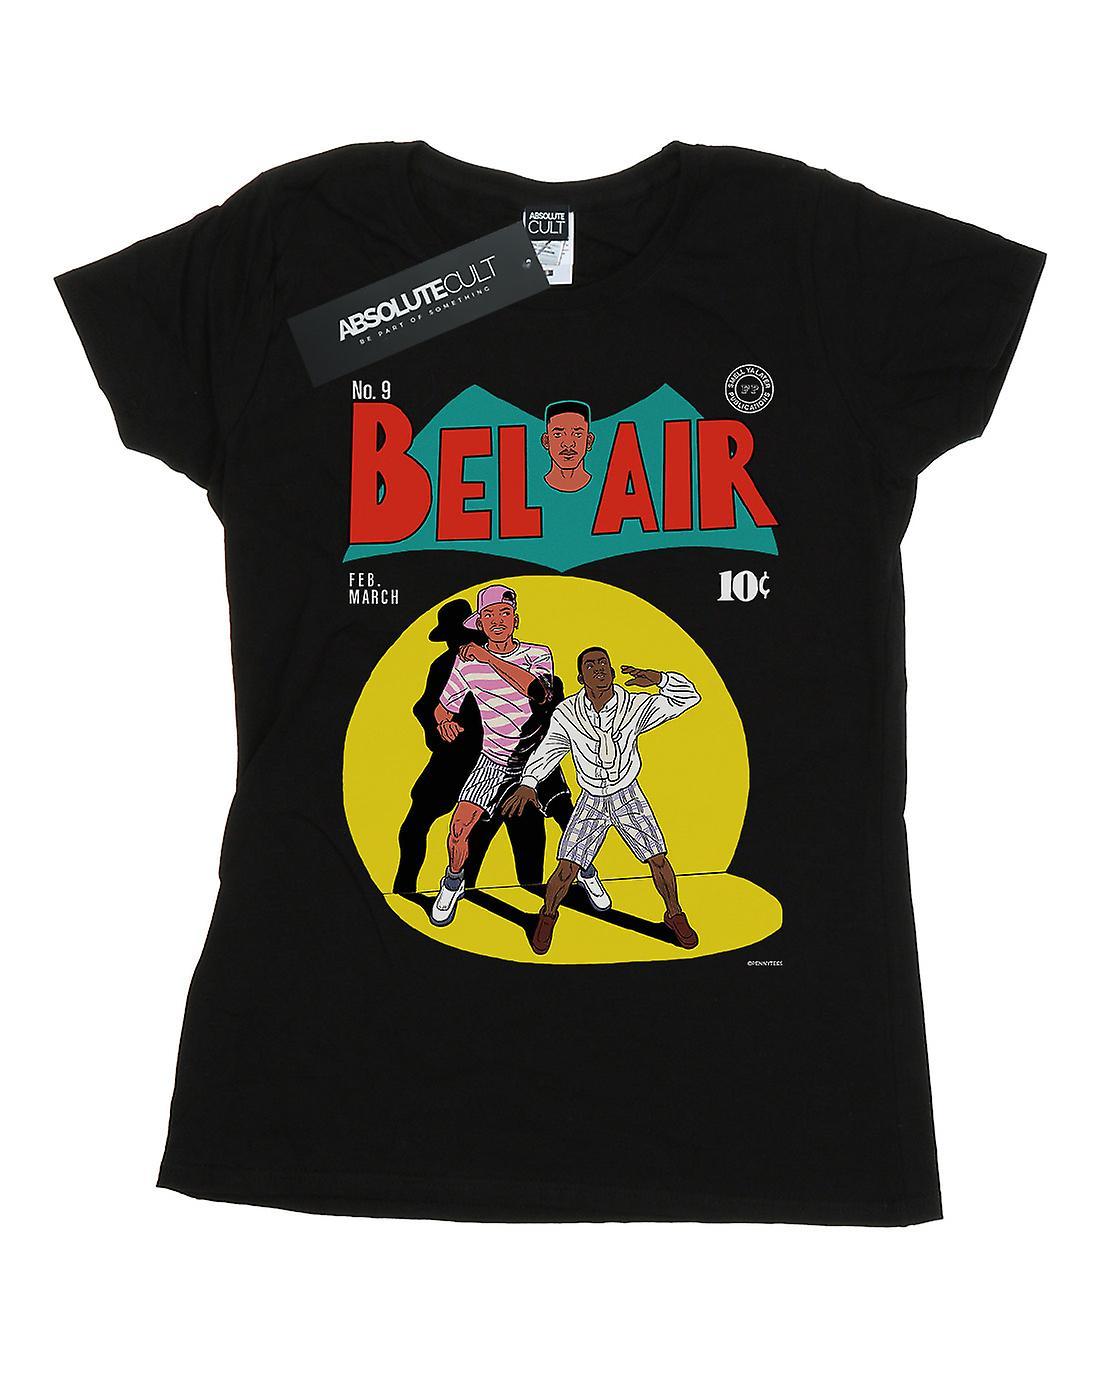 Pennytees Women's Bel Air T-Shirt